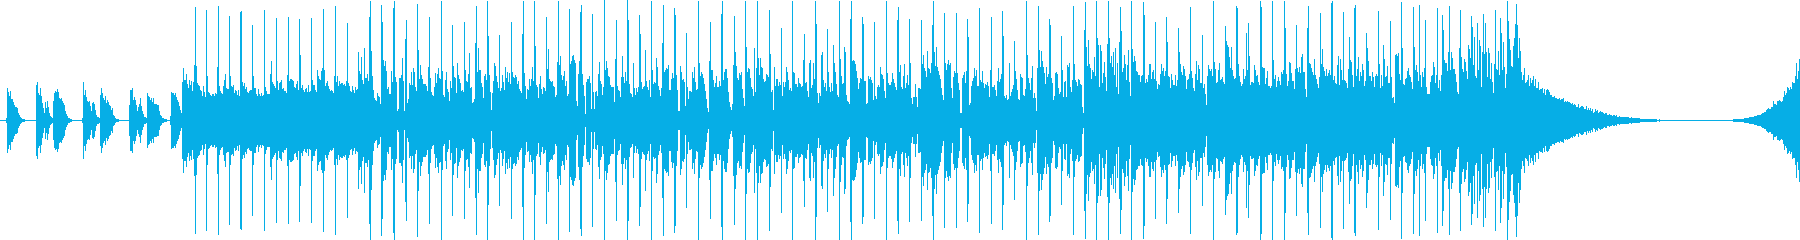 newtralの再生済みの波形